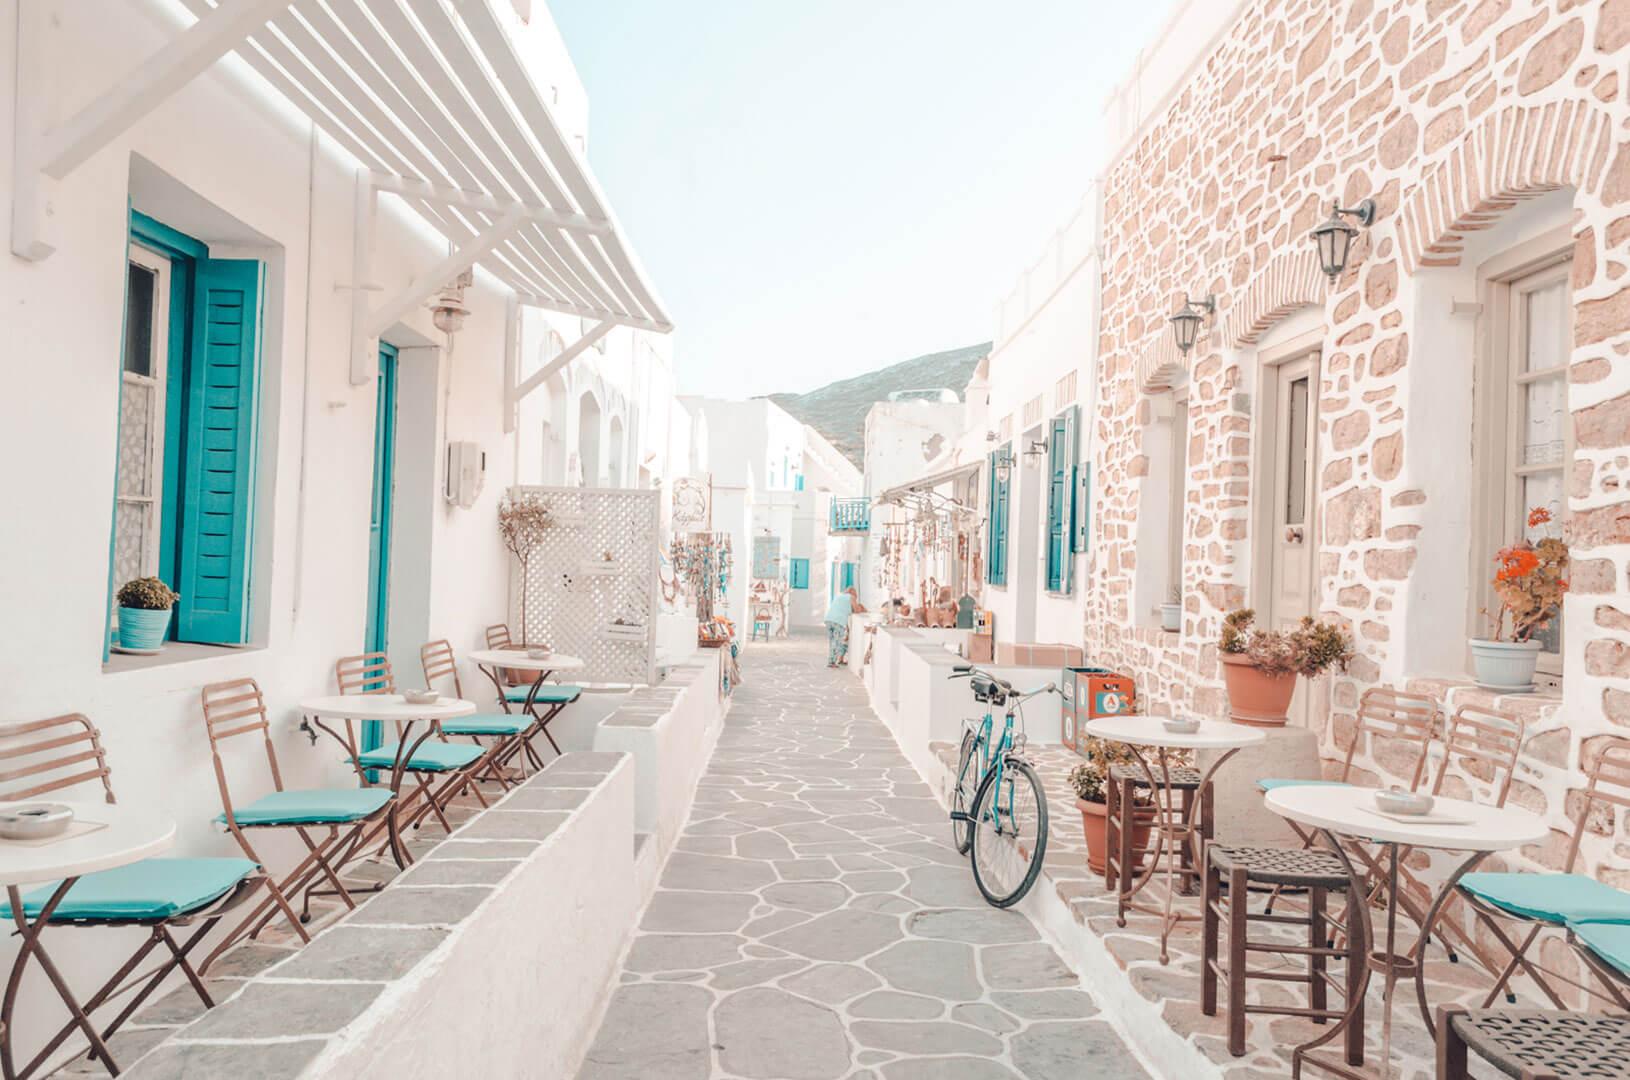 folegandros-cyclades-greece-la-vie-en-blog-all-rights-reserved-3